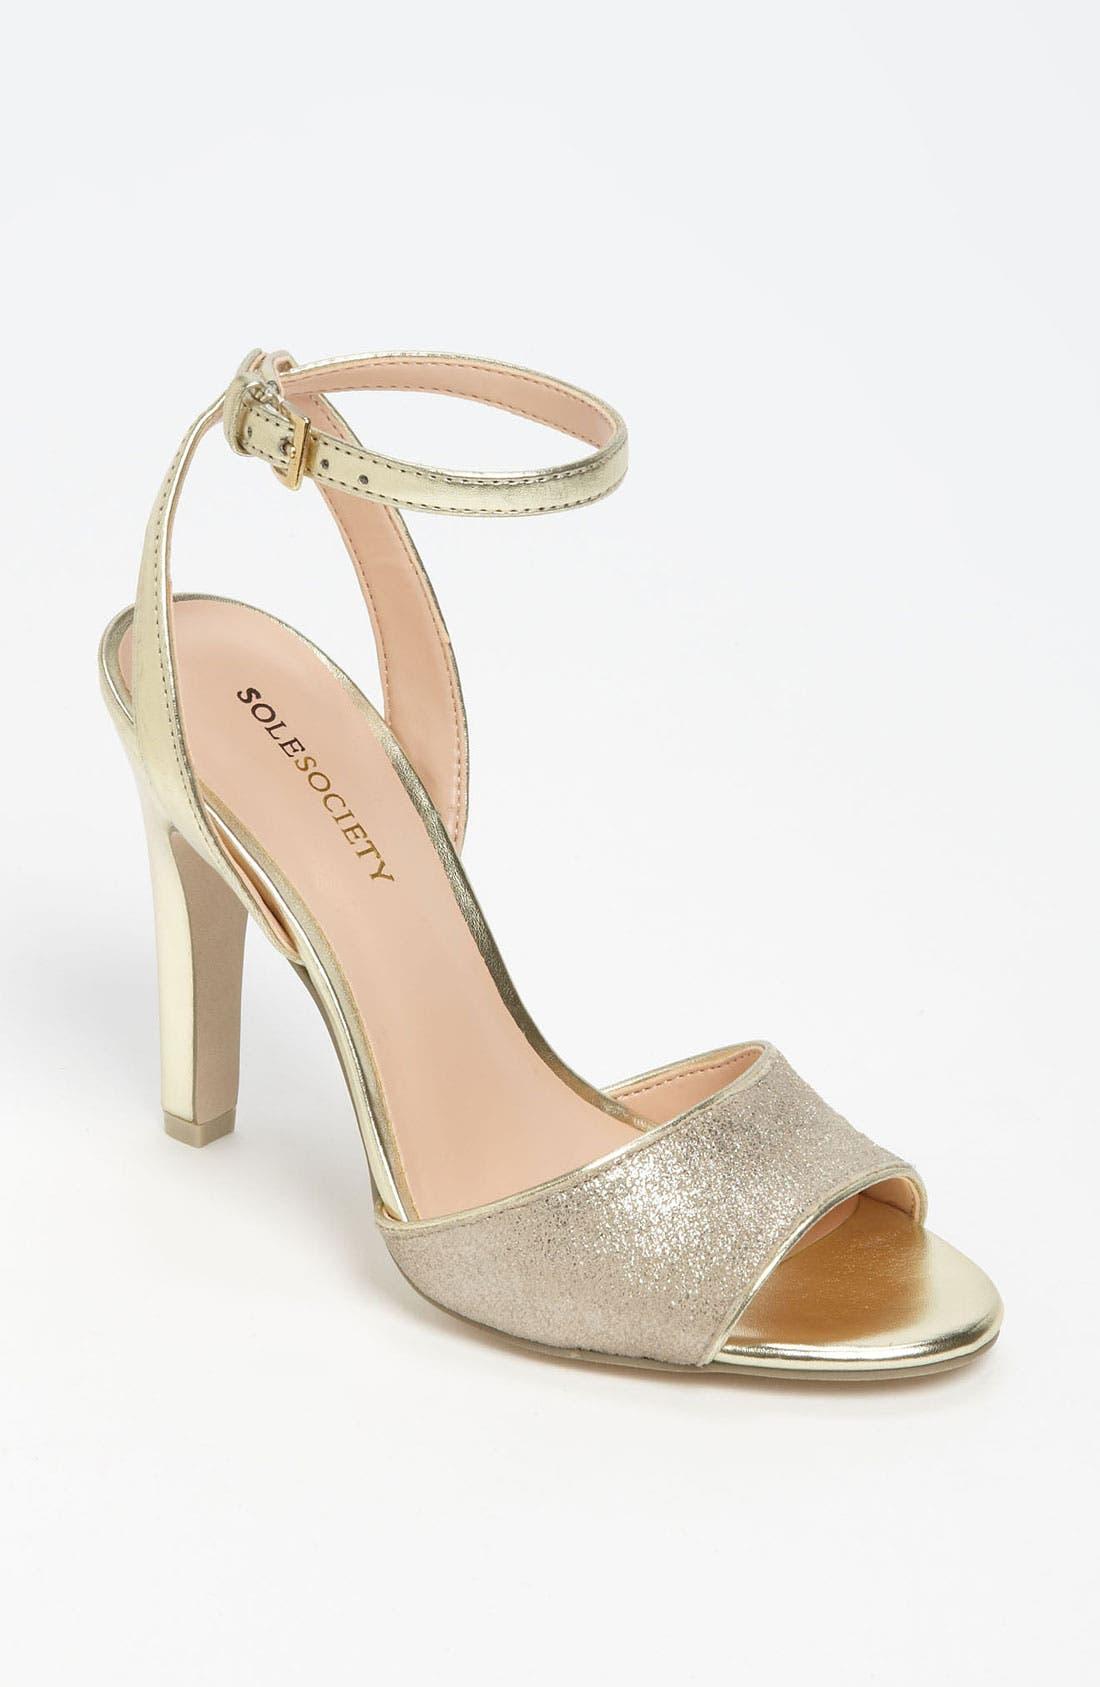 Main Image - Sole Society 'Kimberlee' Sandal